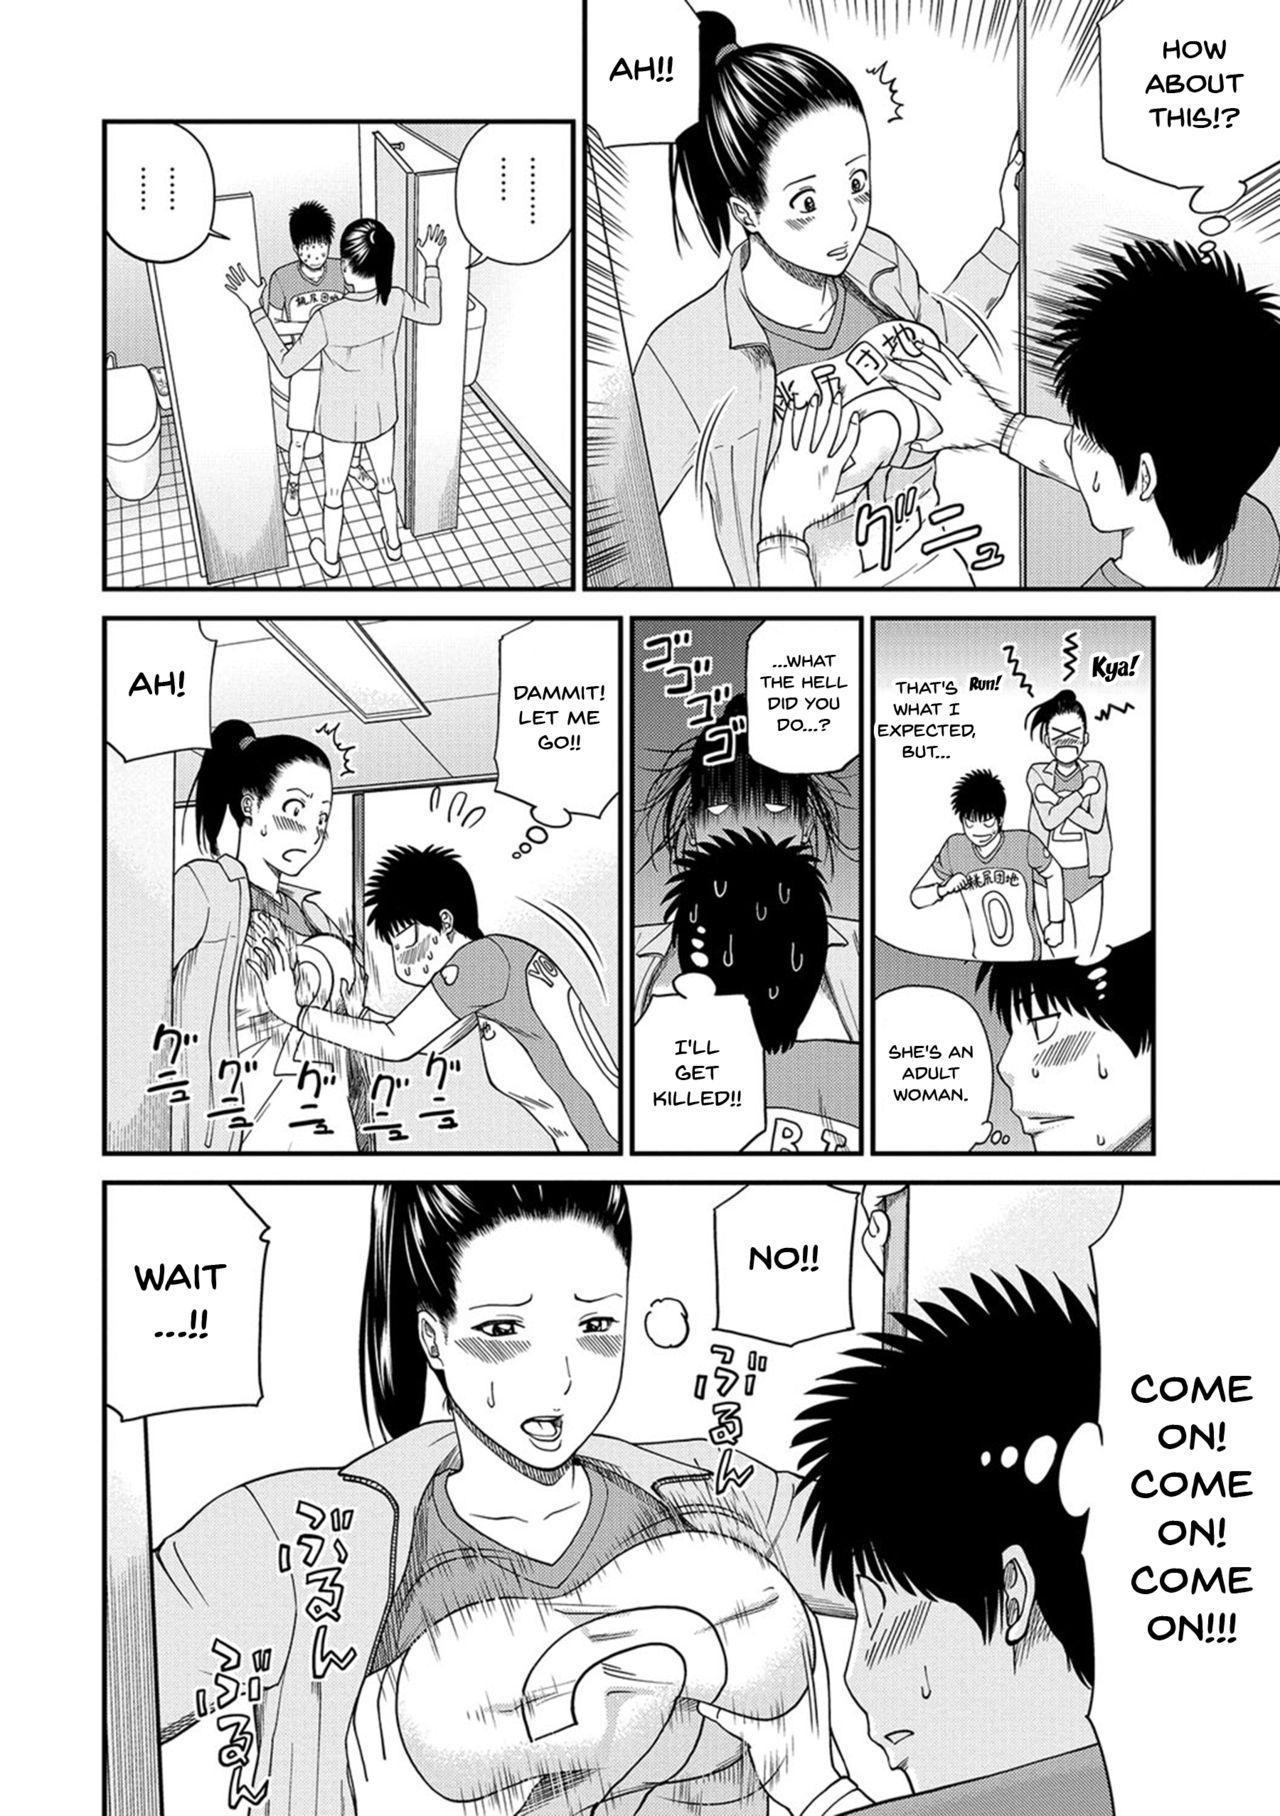 [Kuroki Hidehiko] Momojiri Danchi Mama-san Volley Doukoukai - Mom's Volley Ball | Momojiri District Mature Women's Volleyball Club Ch.1-9 [English] {Doujins.com} [Digital] 31